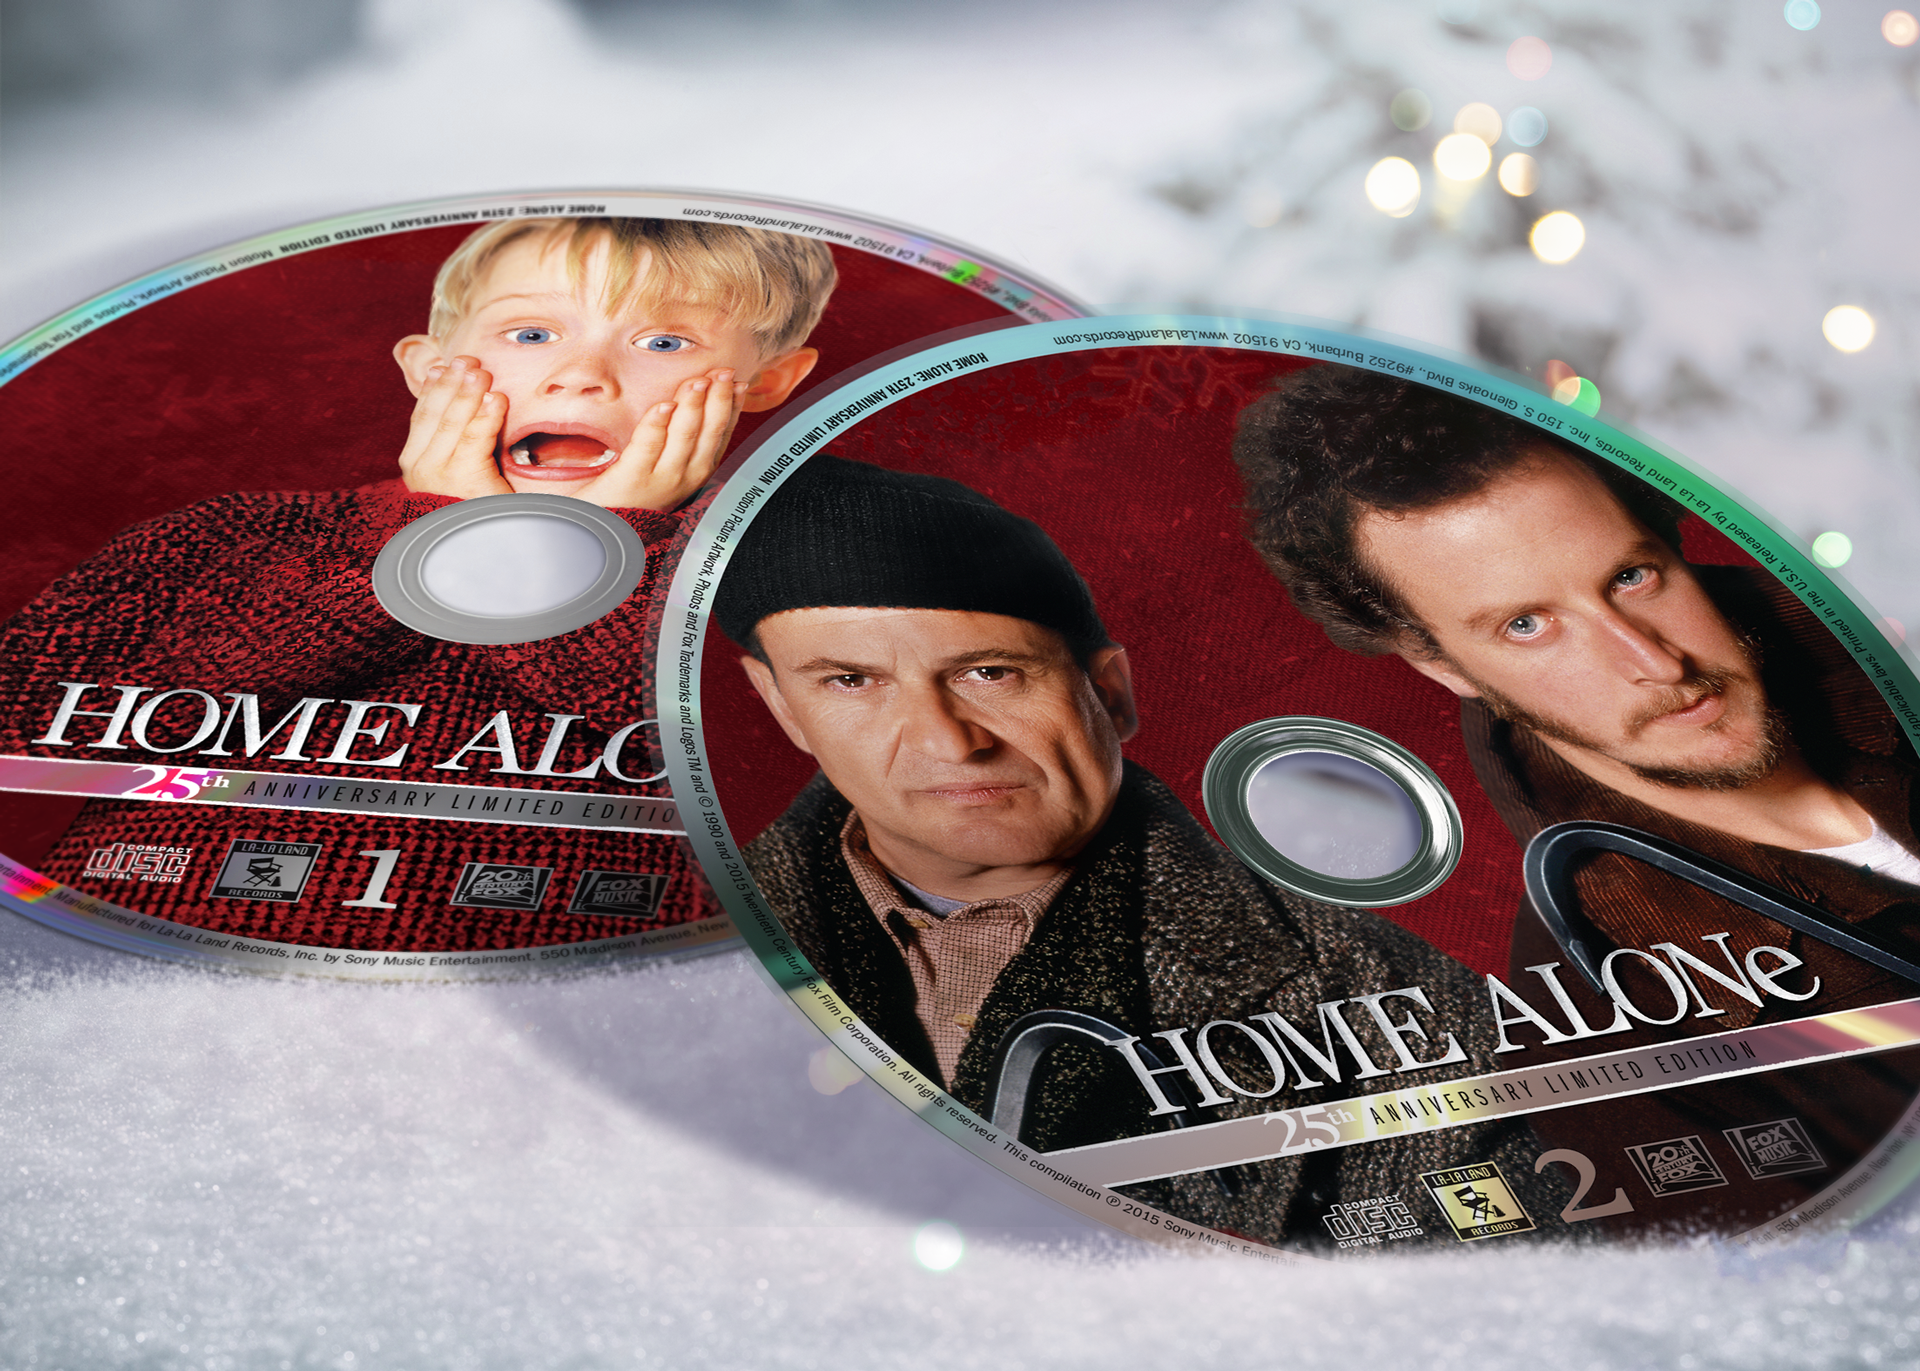 Home alone soundtrack